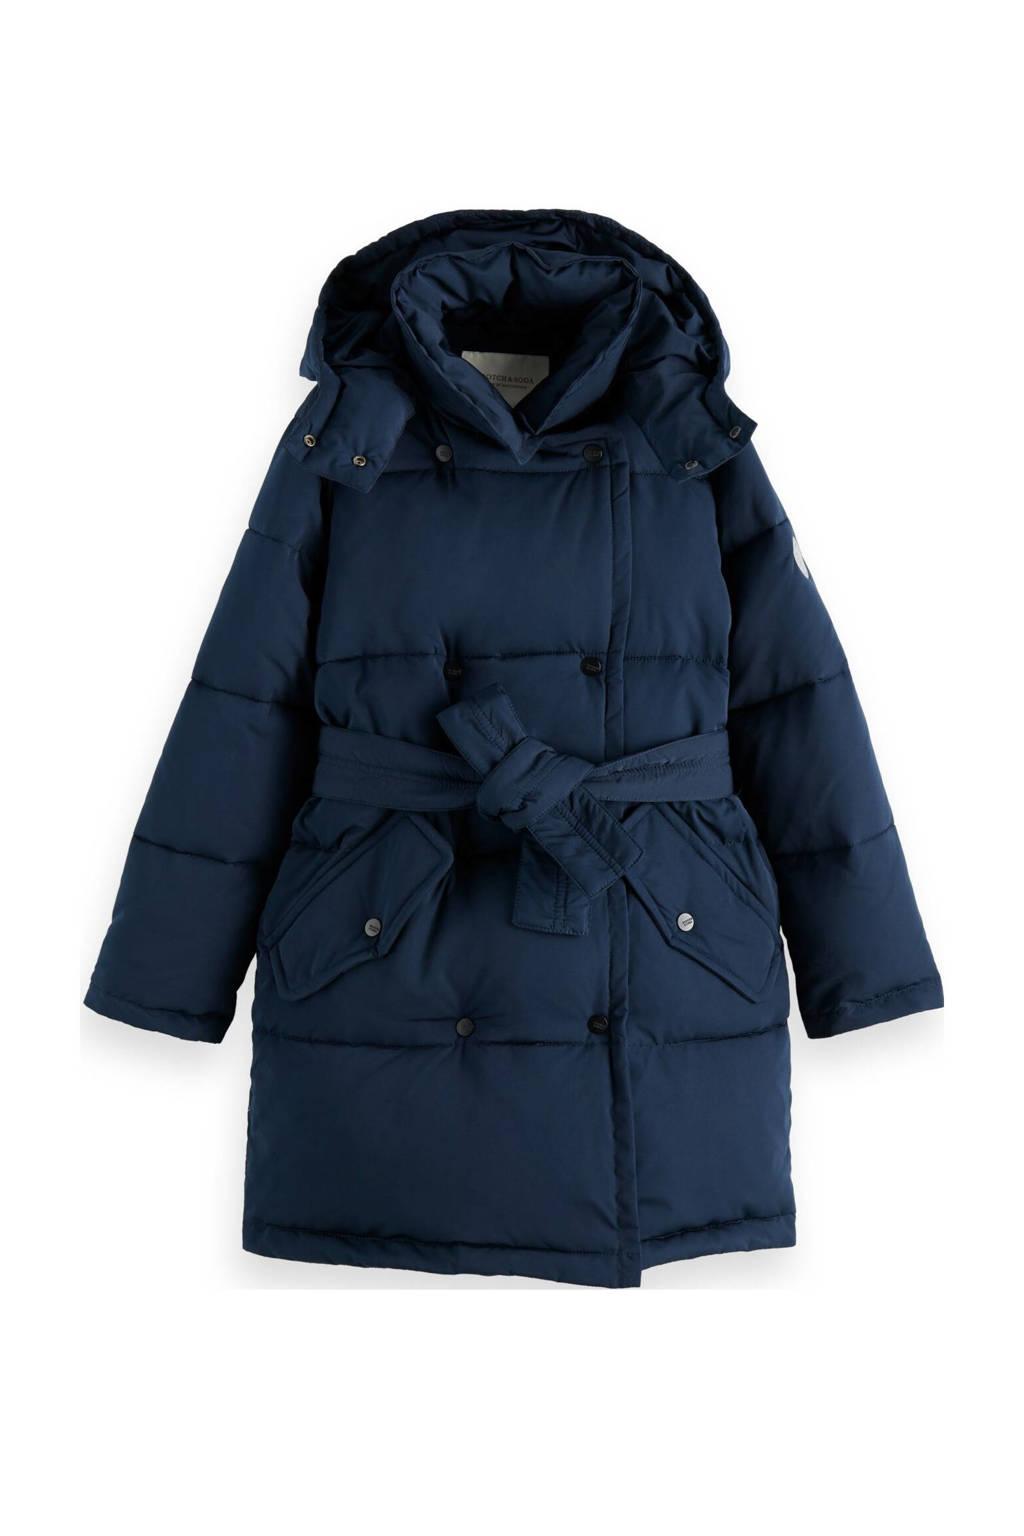 Scotch & Soda  winterjas met ceintuur donkerblauw, Donkerblauw